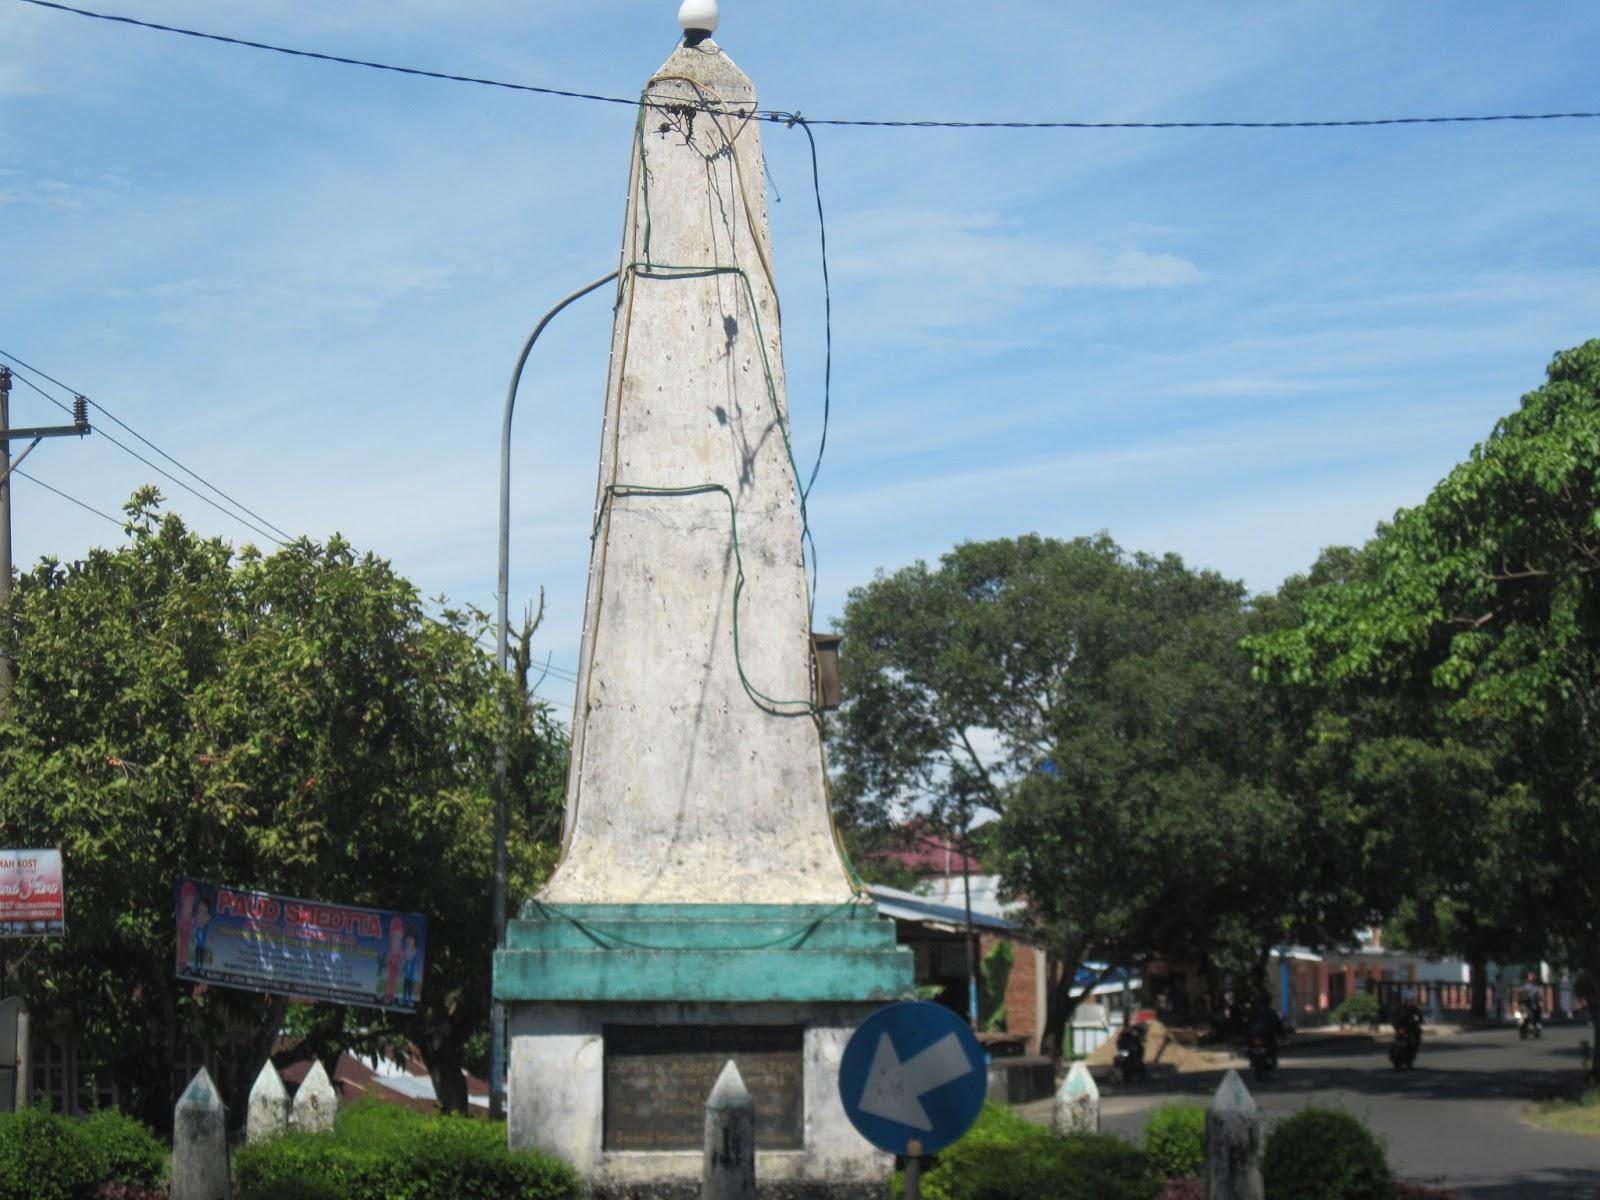 Wigo Aryaguna Macam Tugu Kotamadya Bengkulu Berupa Bangunan Monumental Memperingati